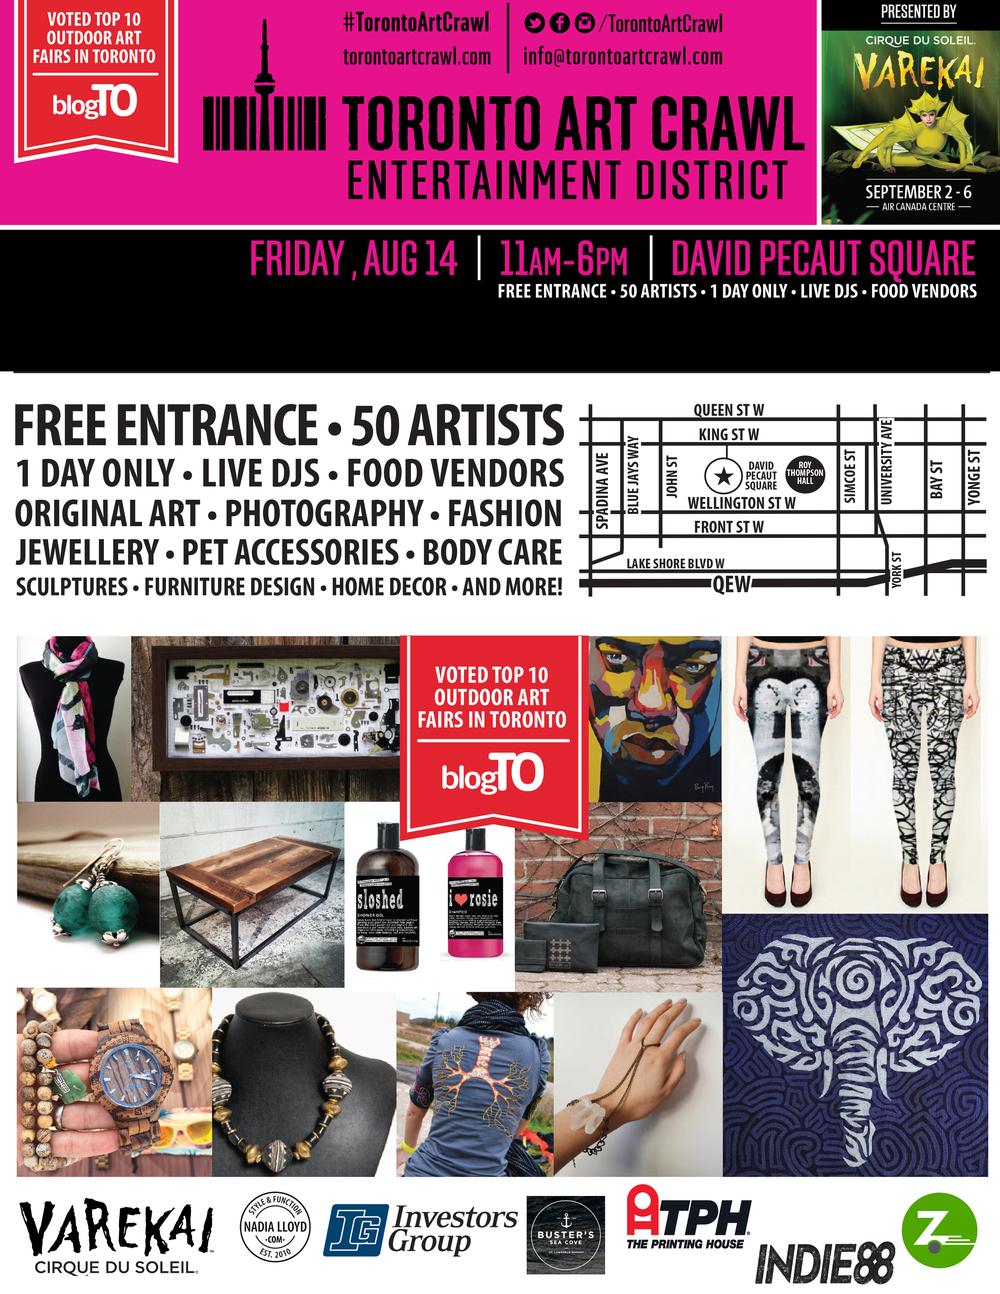 Toronto Art Crawl- Entertainment District Art Crawl Poster_Aug2015.jpg